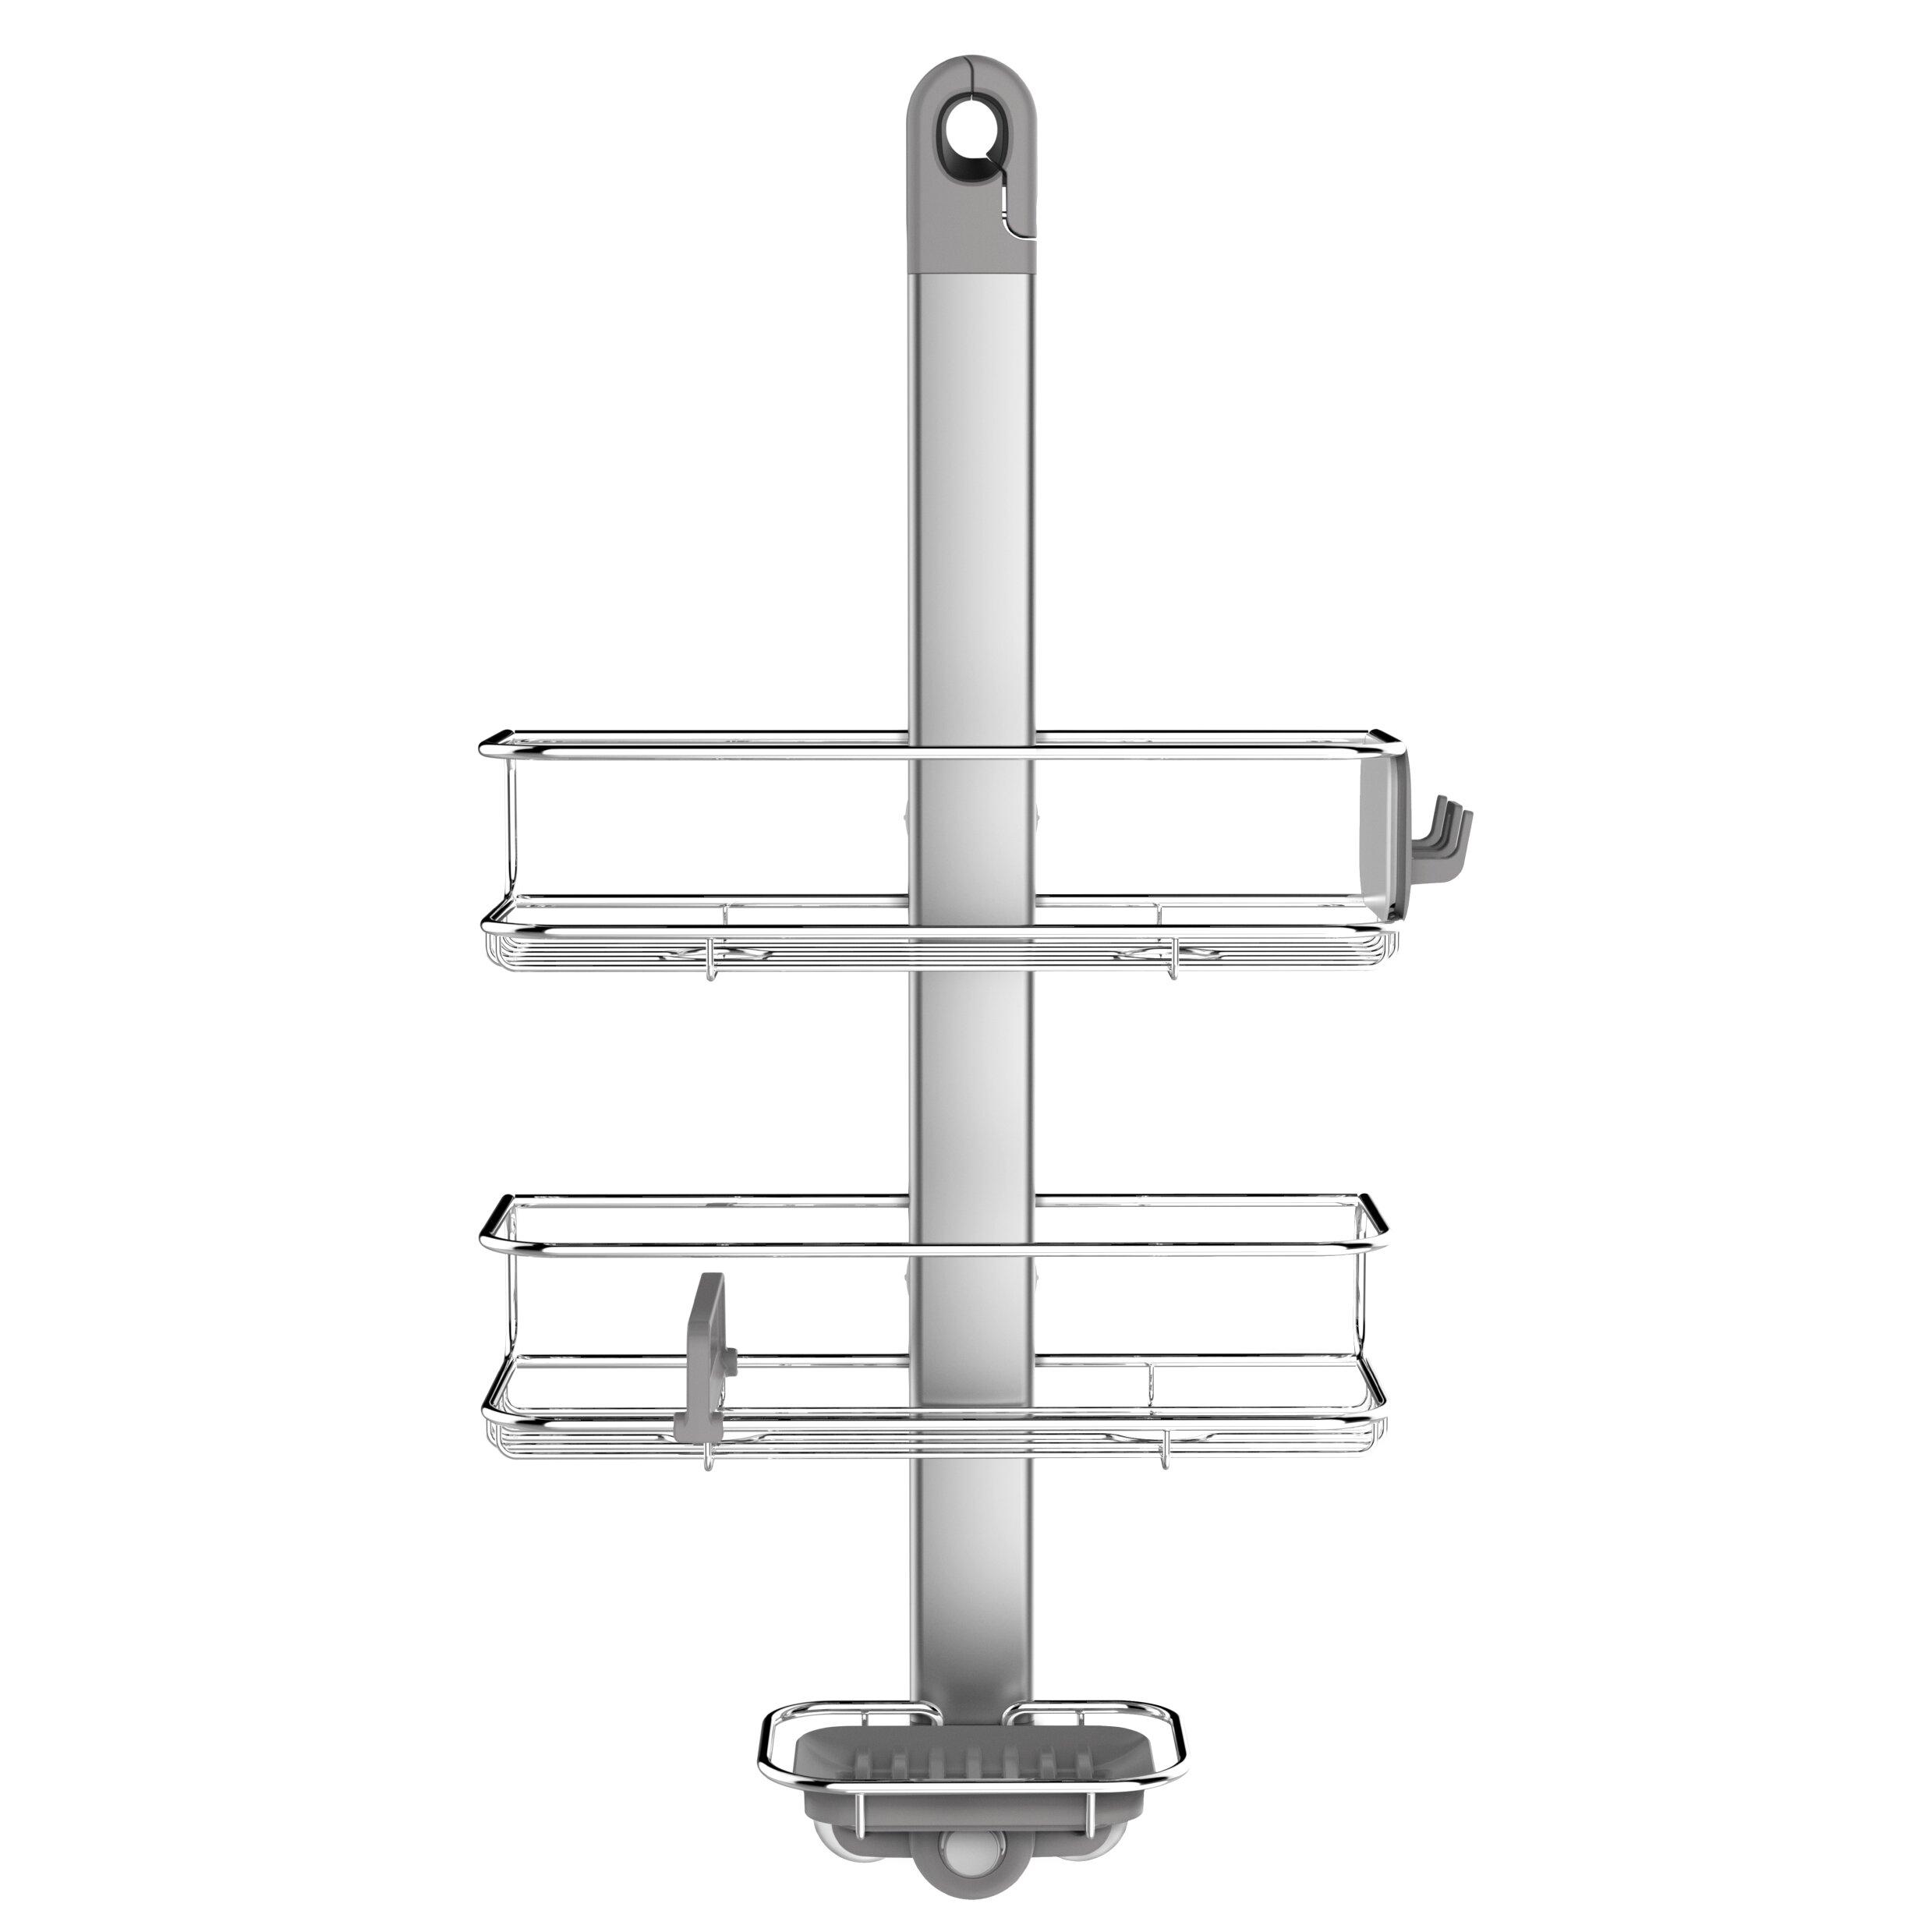 123 caddy gallery 03 123 caddy simplehuman corner tension rod caddy simplehuman corner tension rod shower